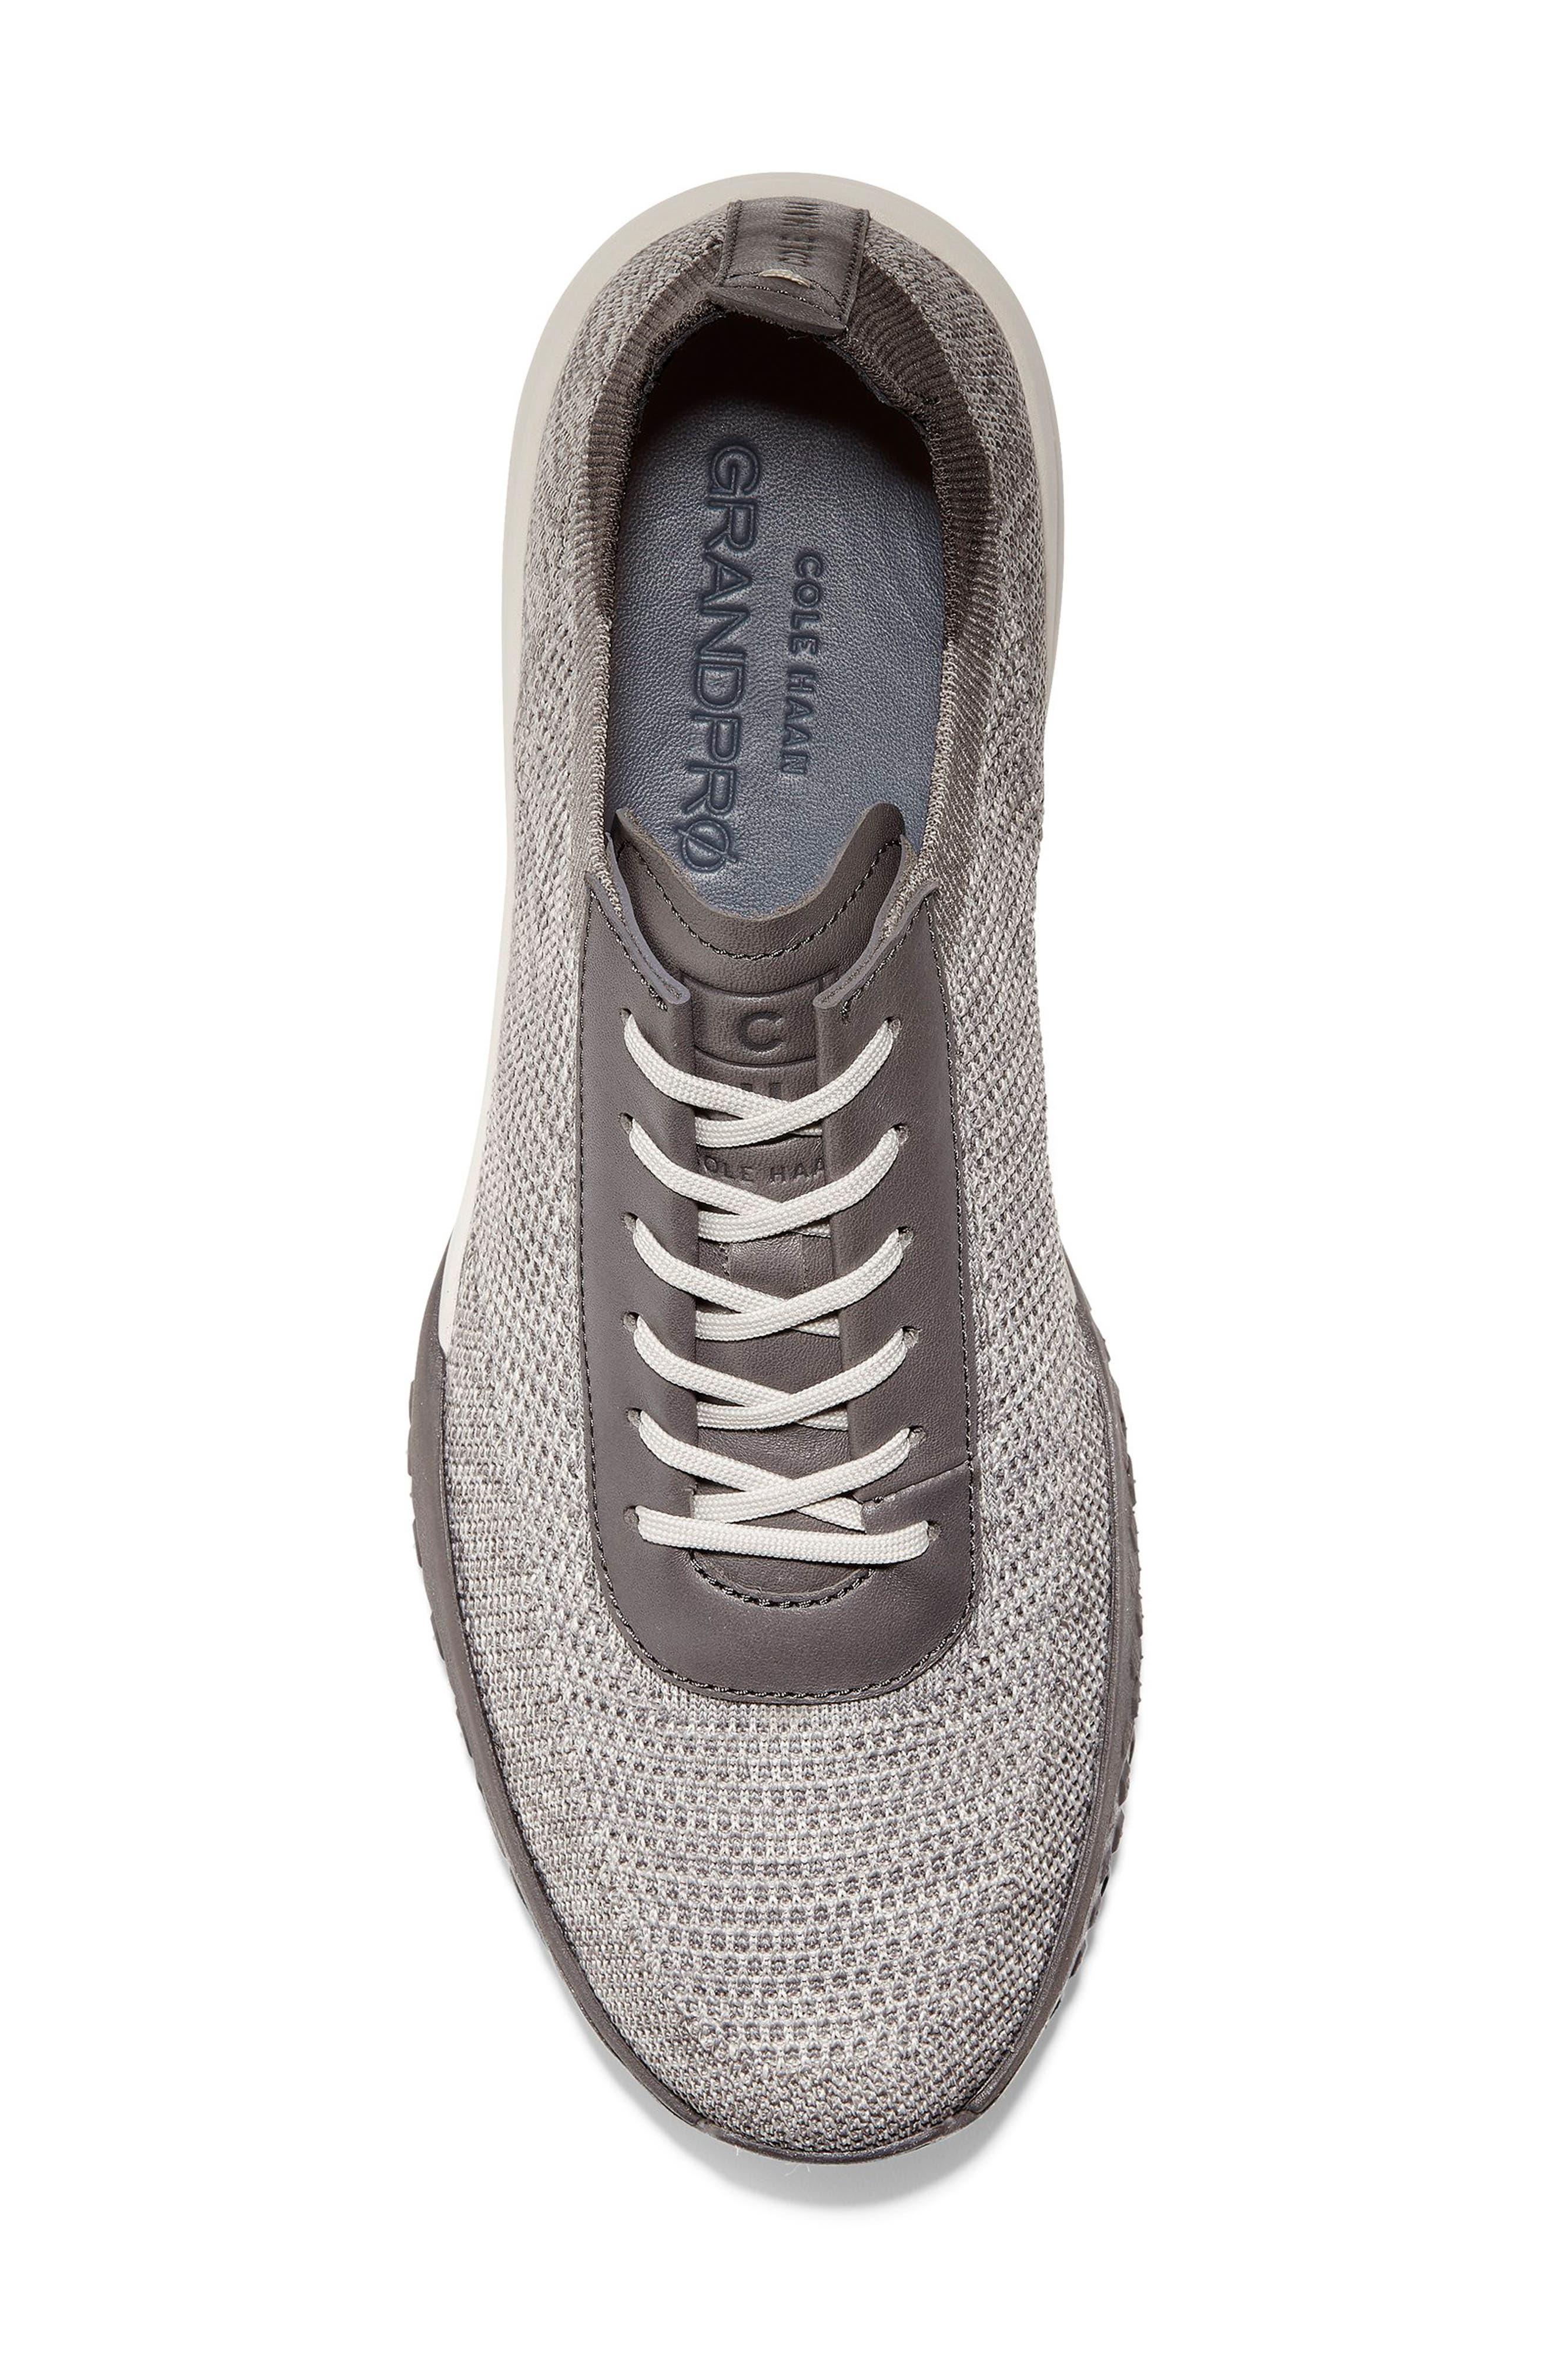 GrandPro Trail Low Stitchlite Sneaker,                             Alternate thumbnail 5, color,                             BLACK/ VAPOR GREY KNIT